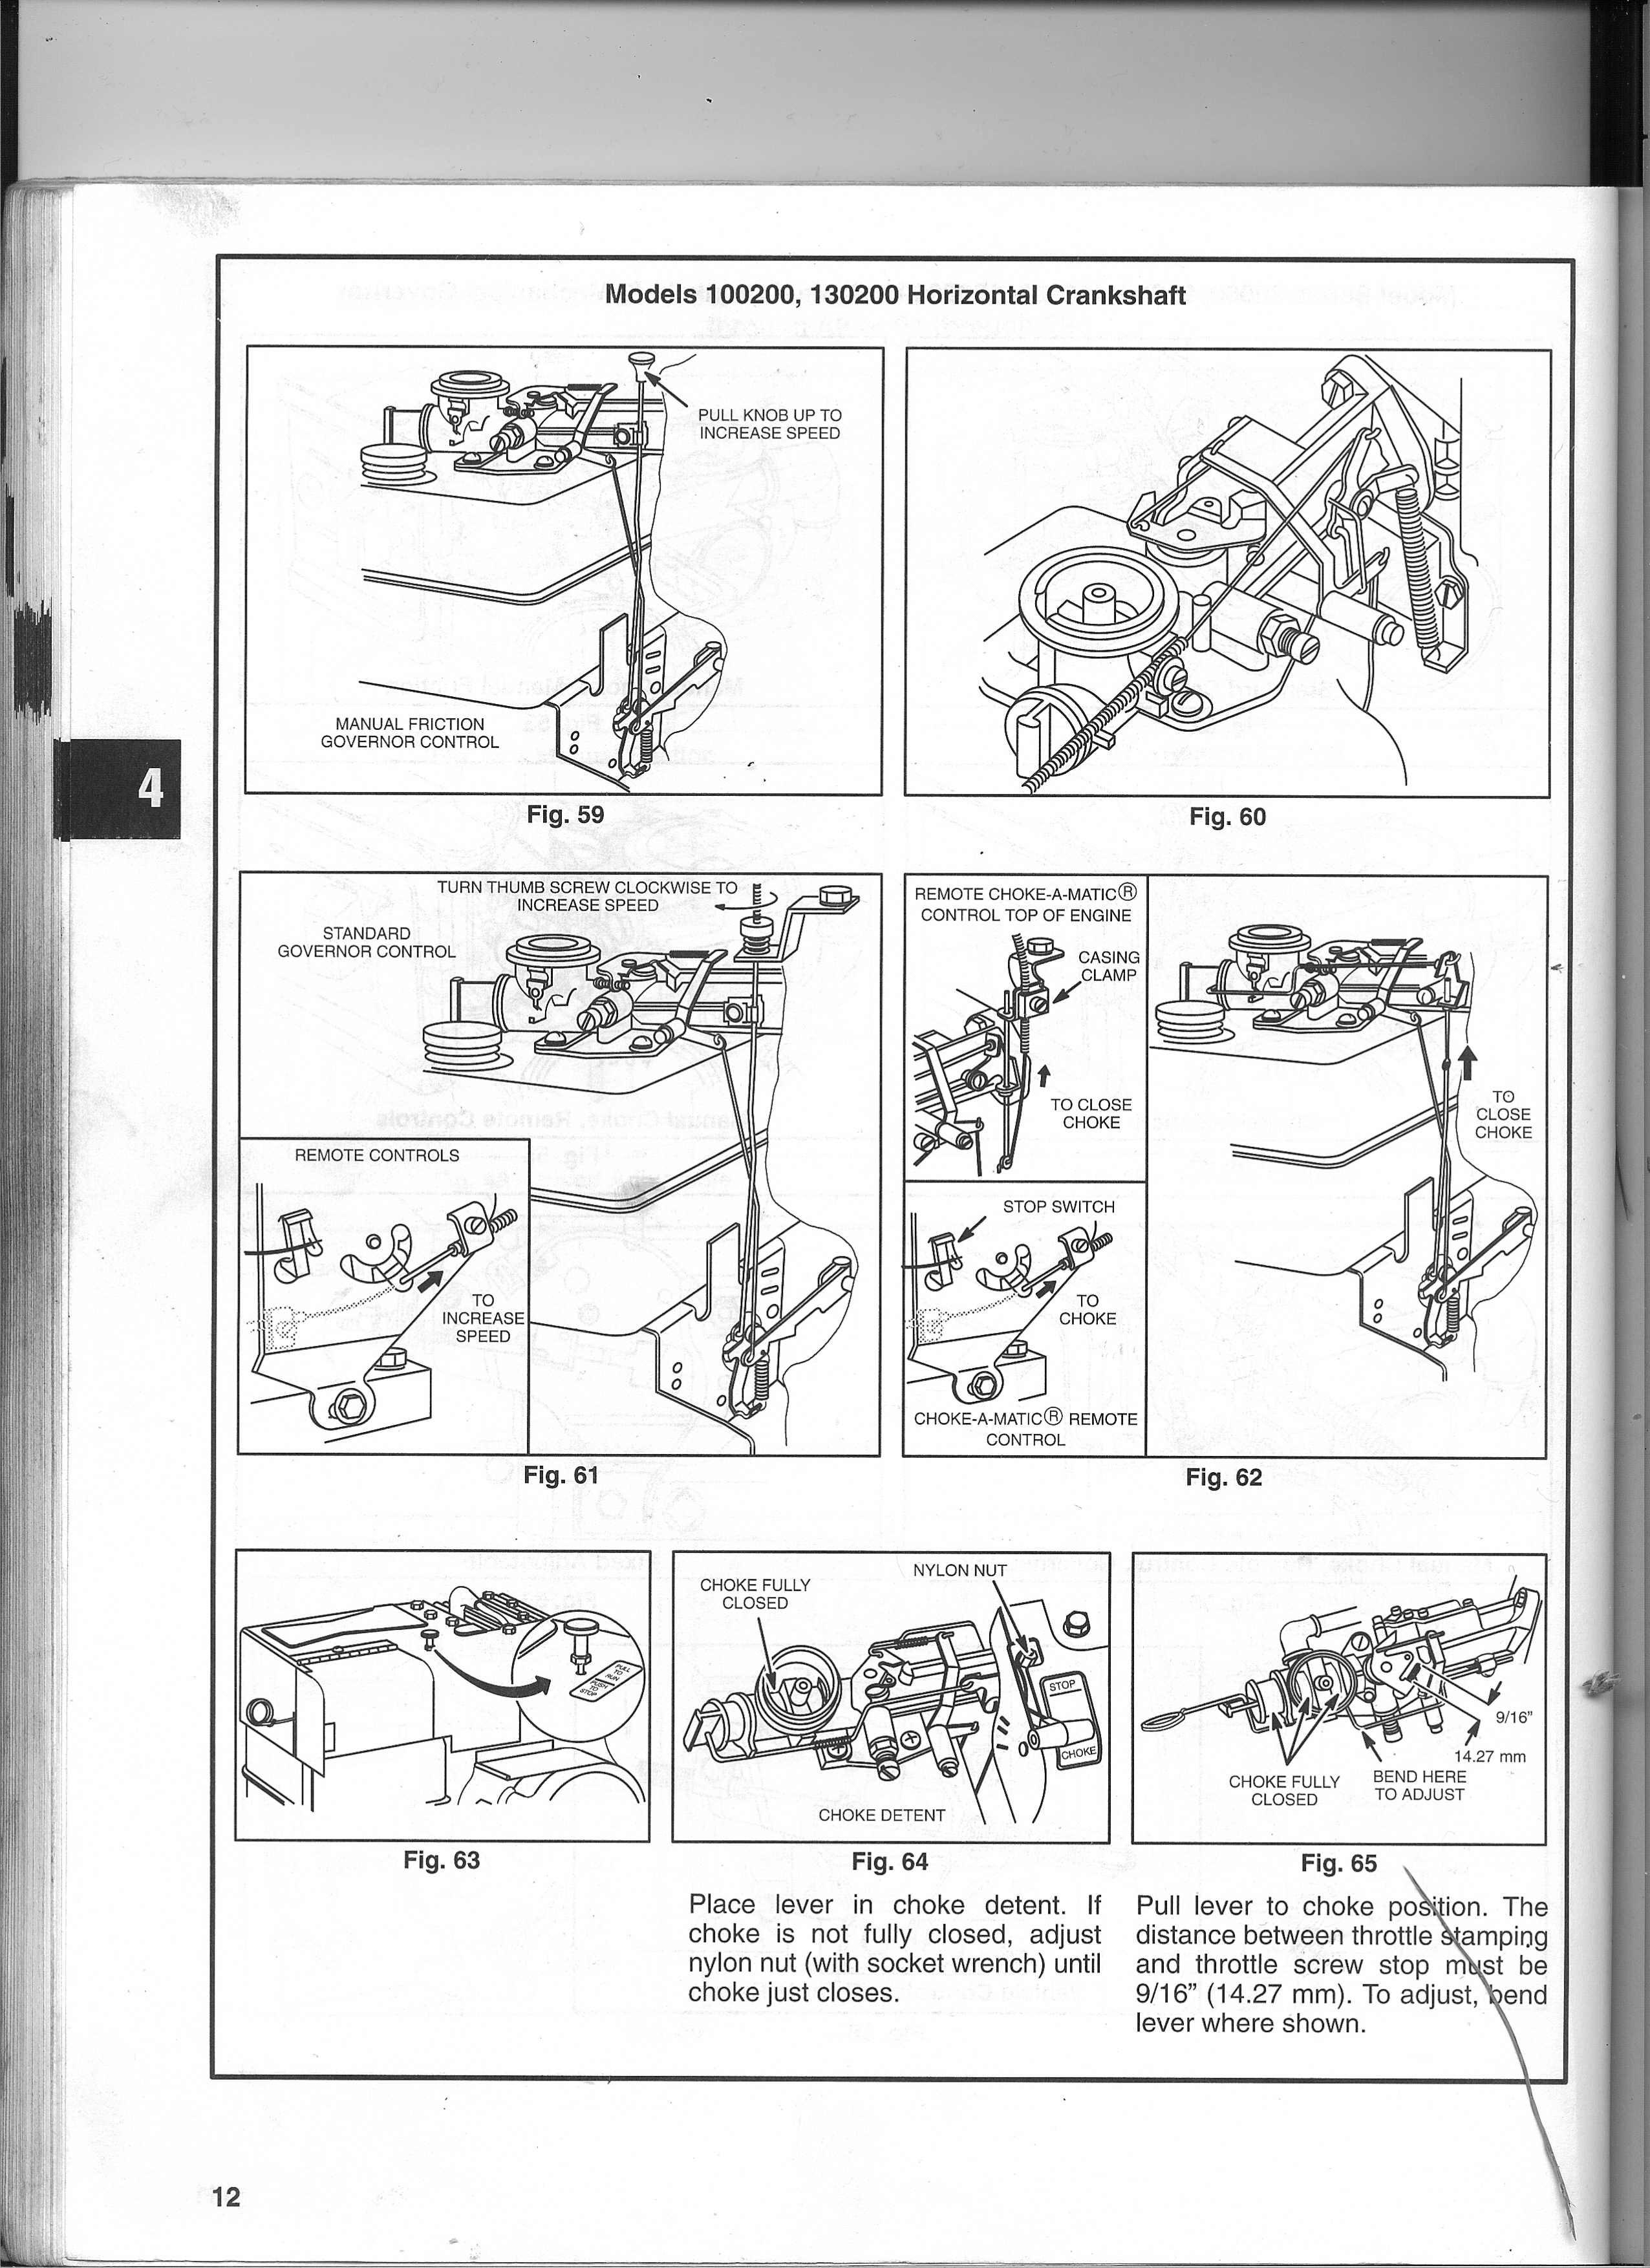 8 Hp Briggs and Stratton Engine Parts Diagram Stunning Briggs and Stratton Engine Breakdown Simple Wiring Of 8 Hp Briggs and Stratton Engine Parts Diagram